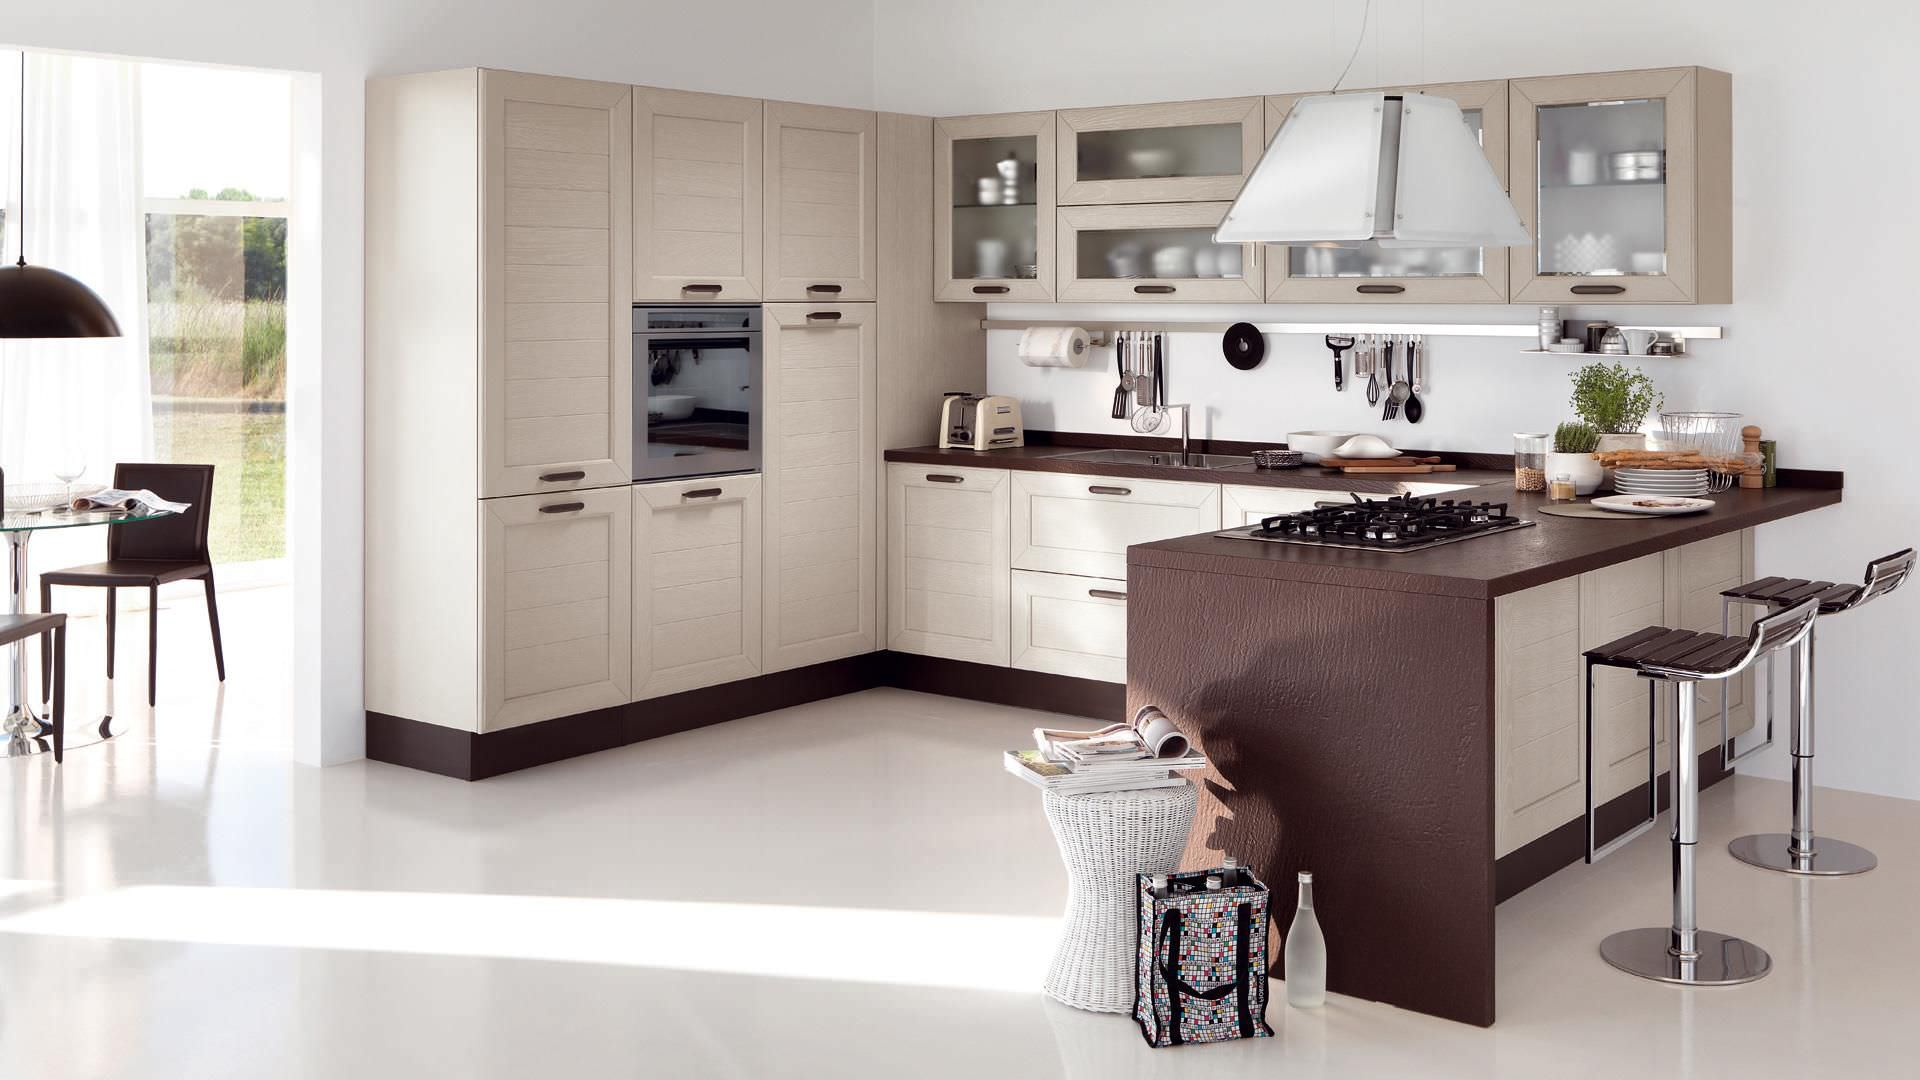 Cucina moderna / in legno / con impugnature CLAUDIA CUCINE LUBE